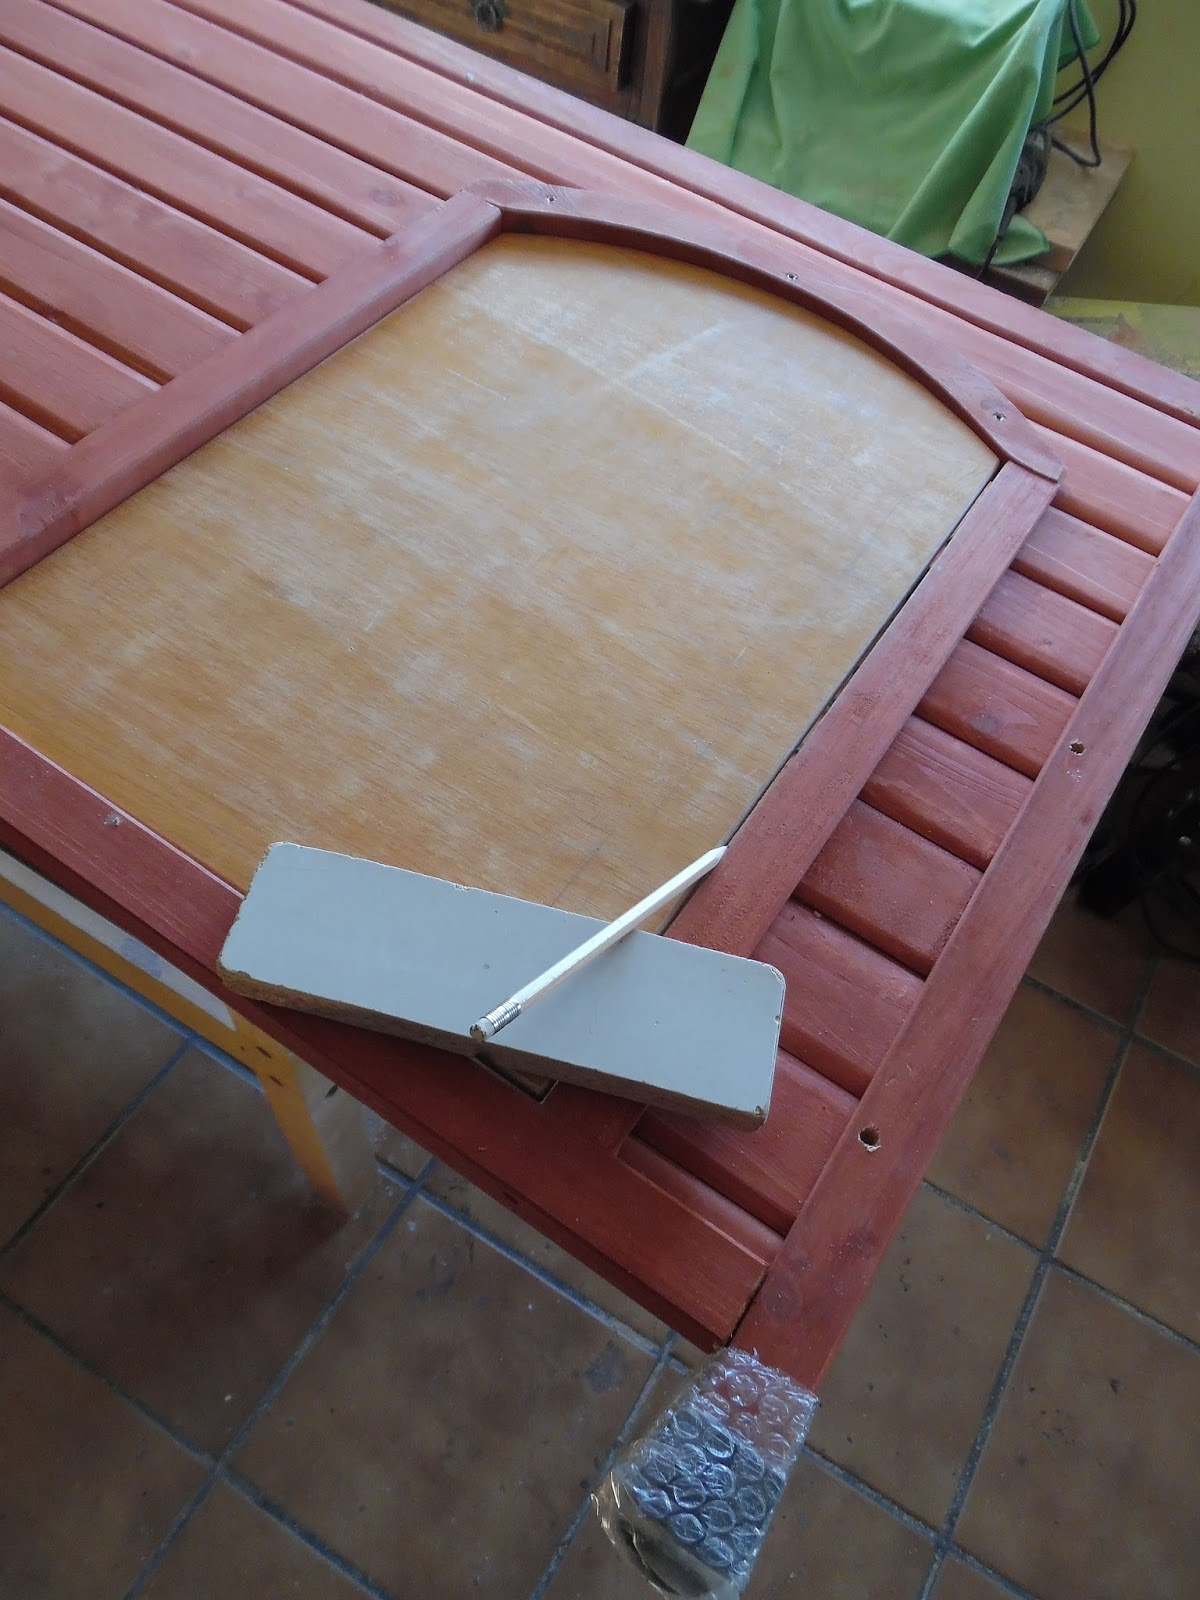 Hacer una puerta de madera cheap puerta de madera de - Hacer puertas de madera ...